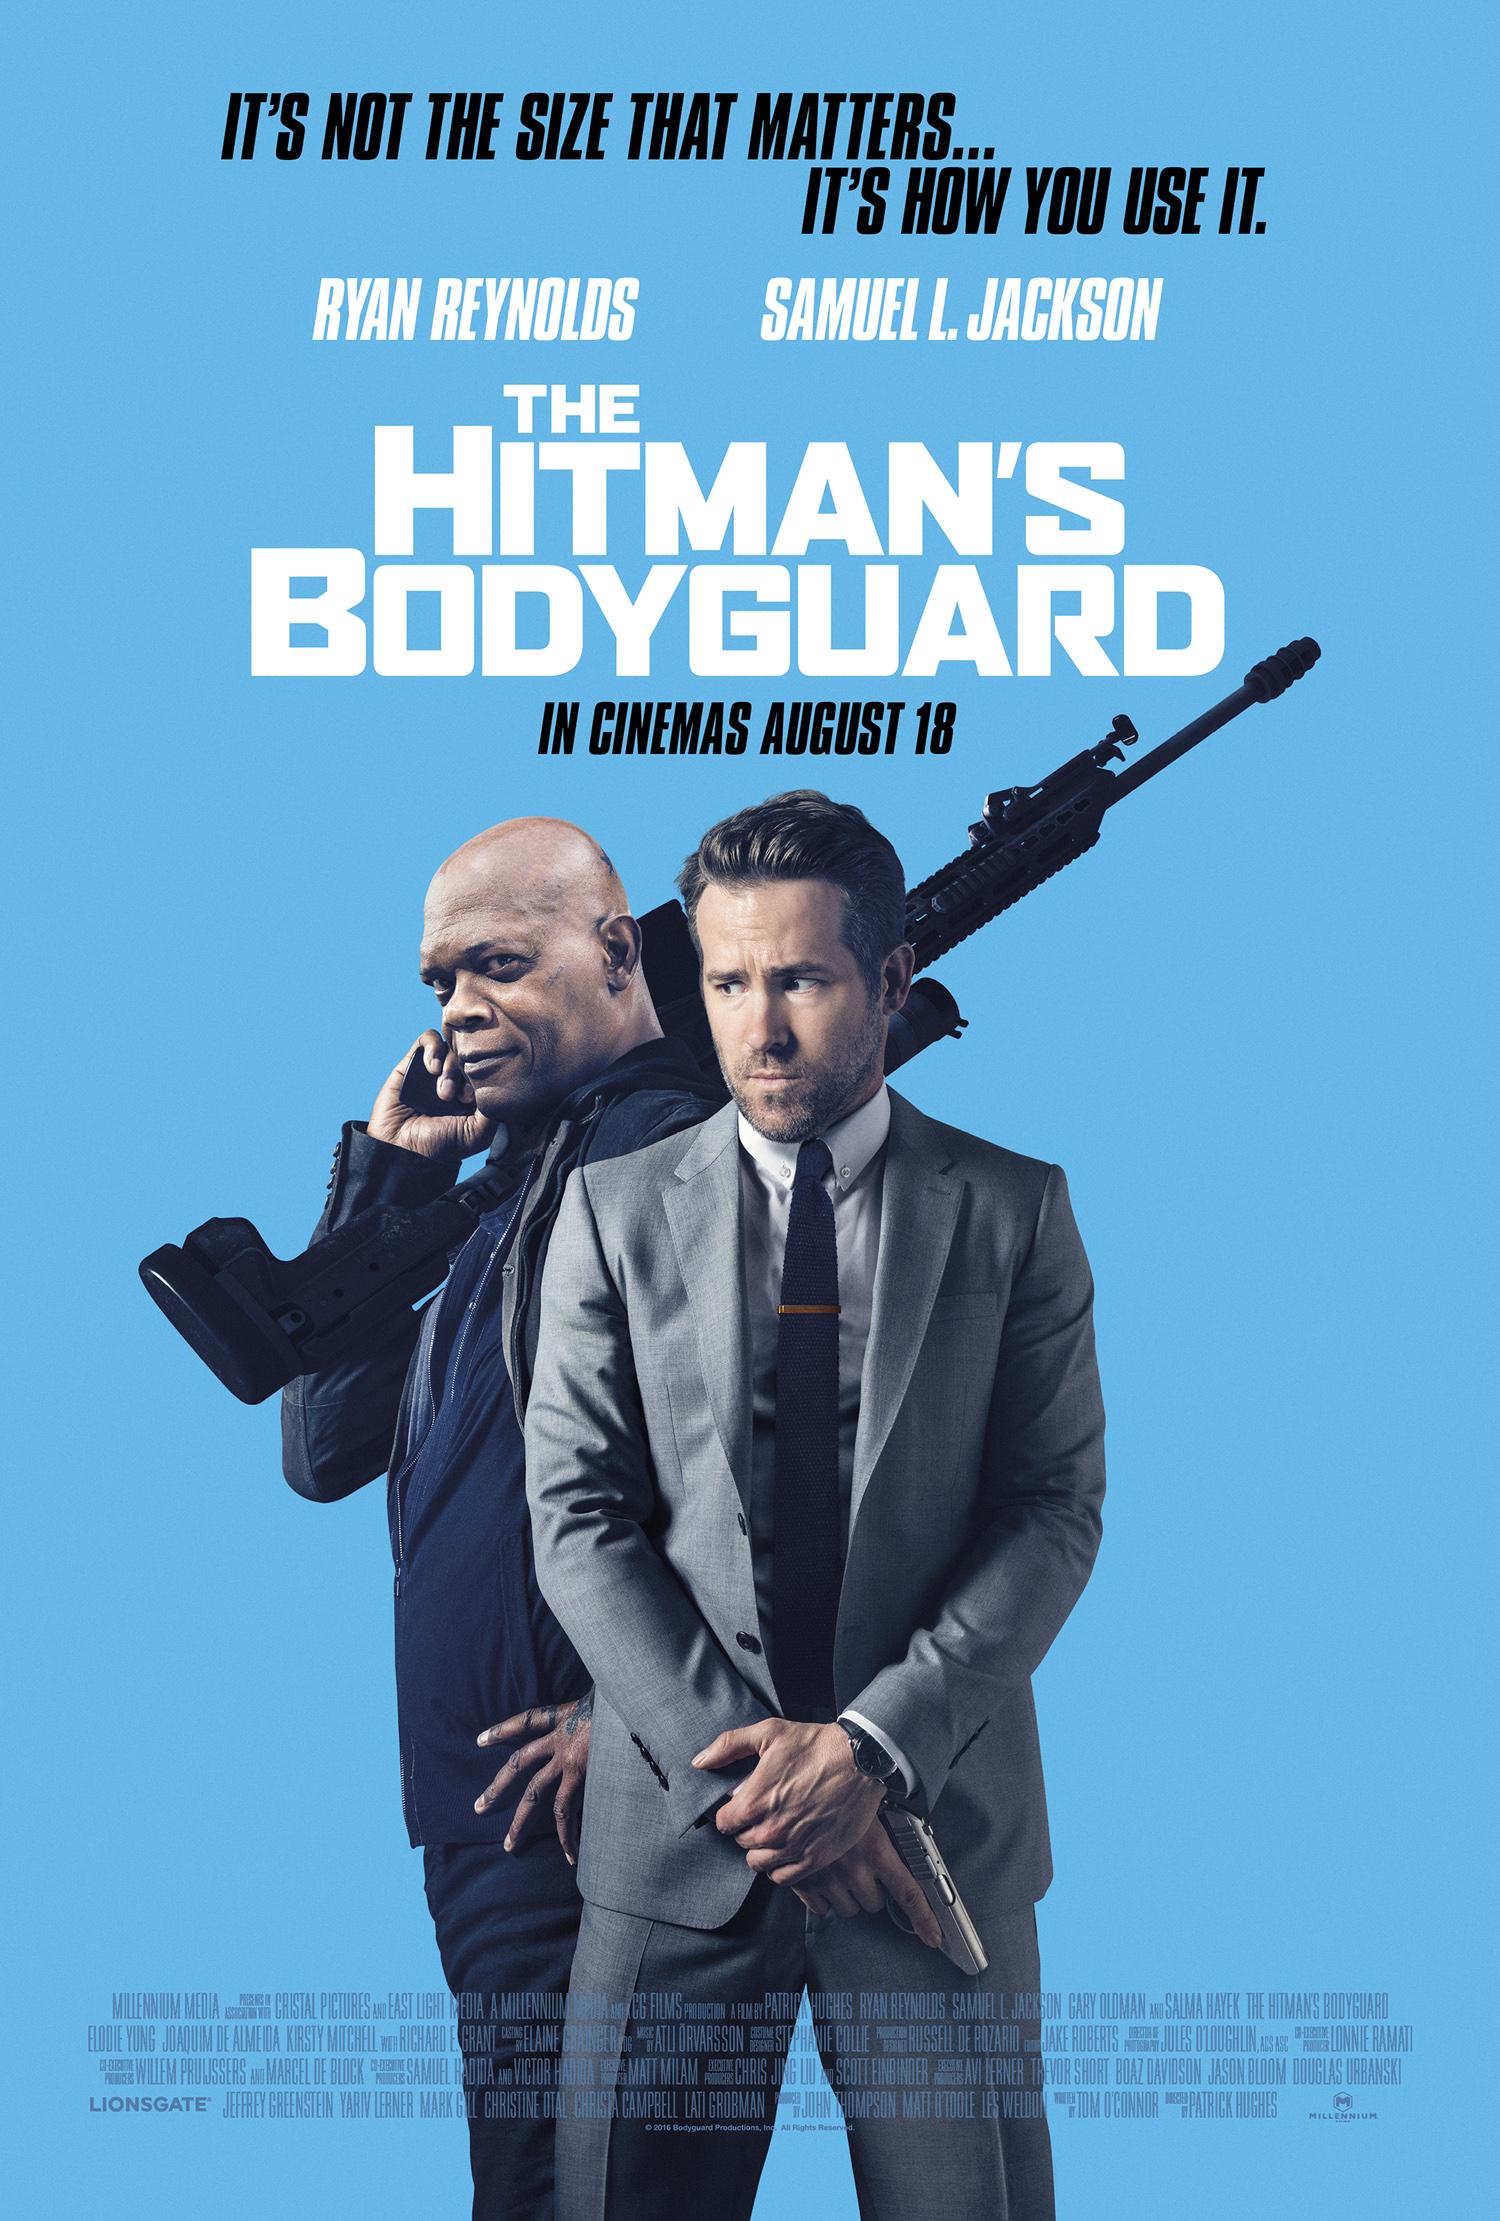 the hitman's bodyguard poster